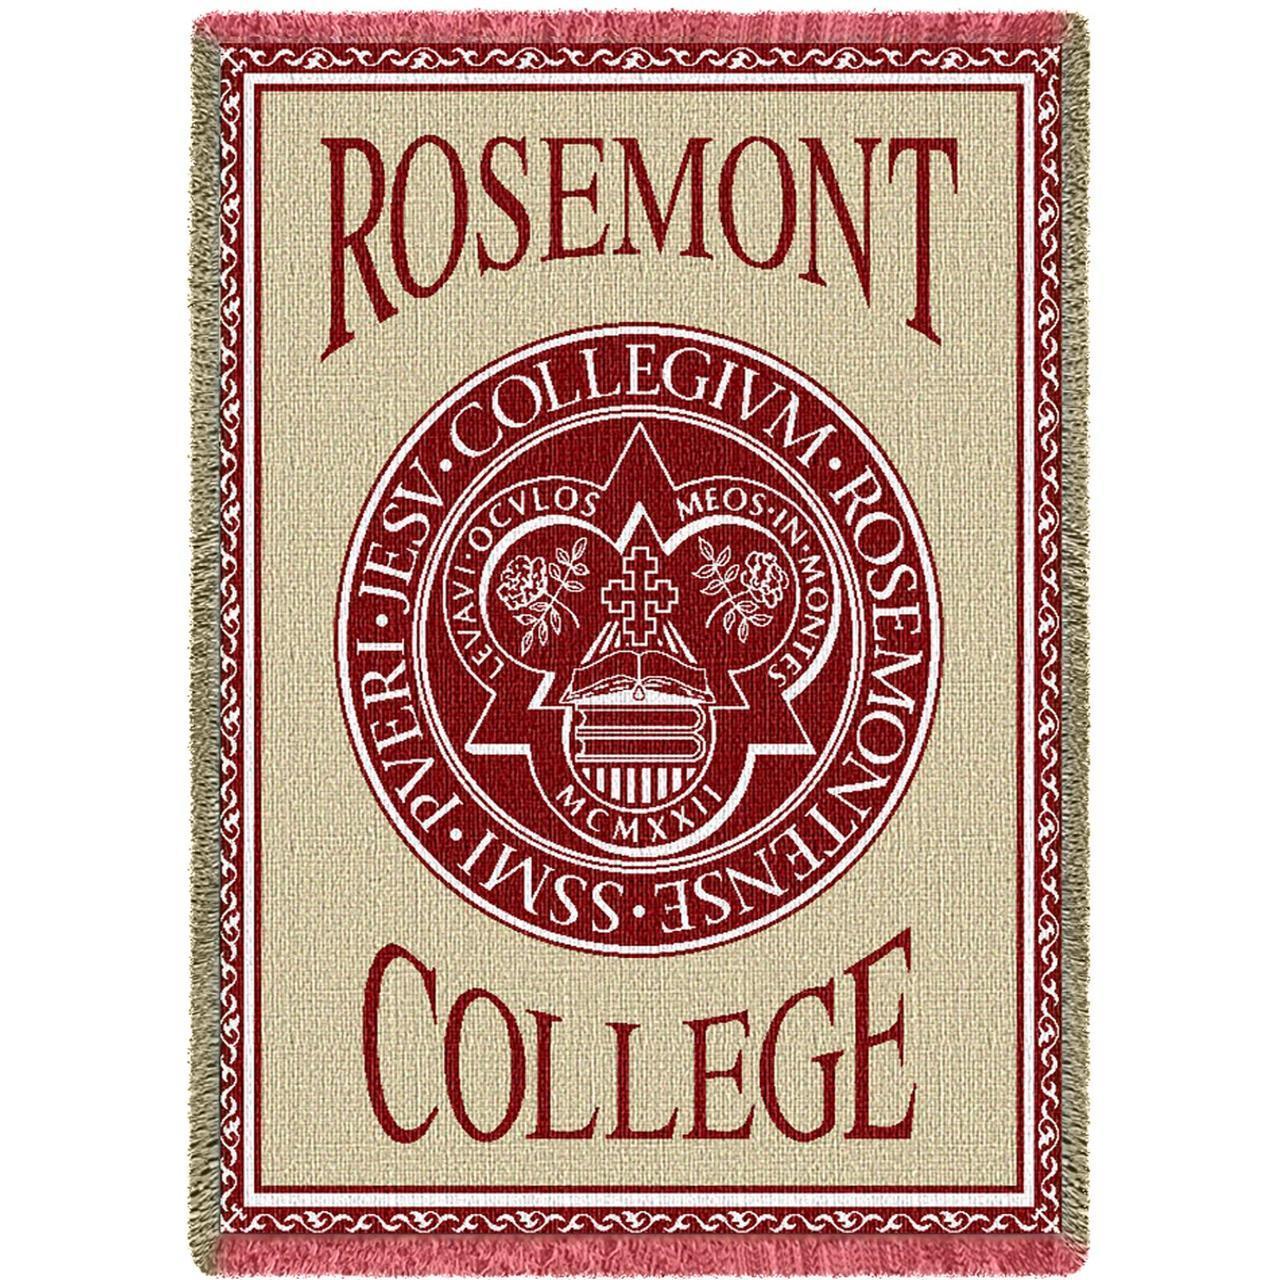 Woven Rosemont Seal Blanket